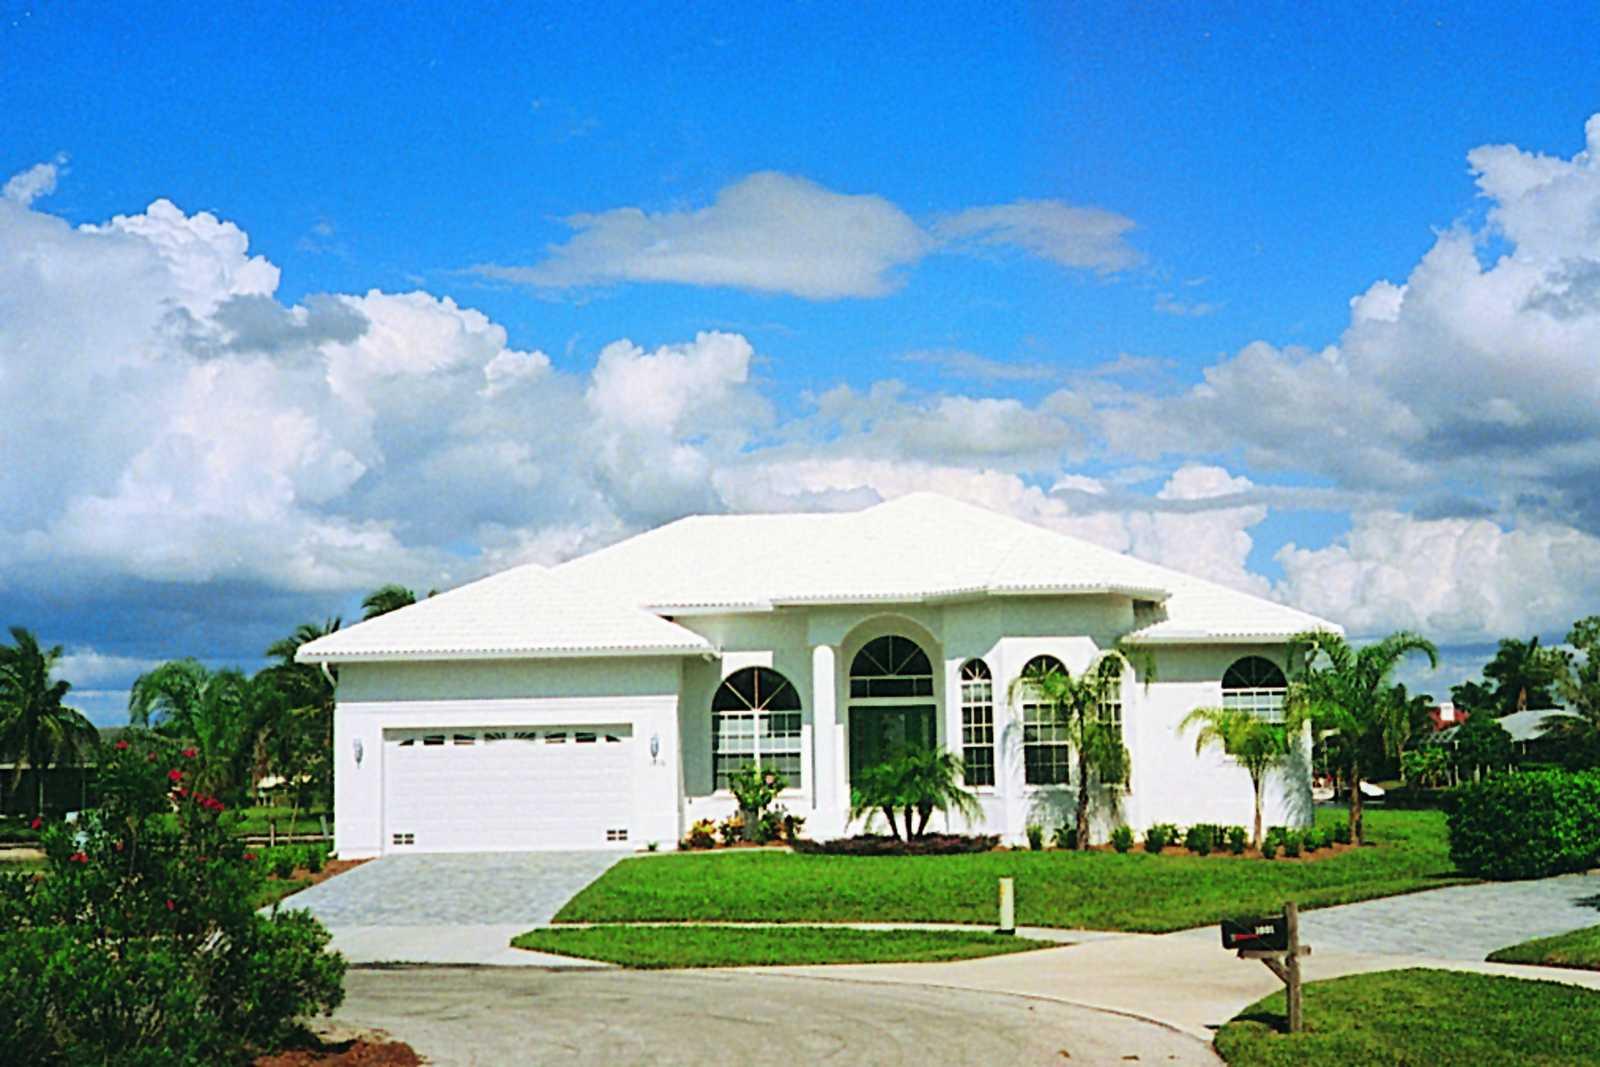 Hotel, Florida: Villen & Häuser an der Golfküste | CANUSA